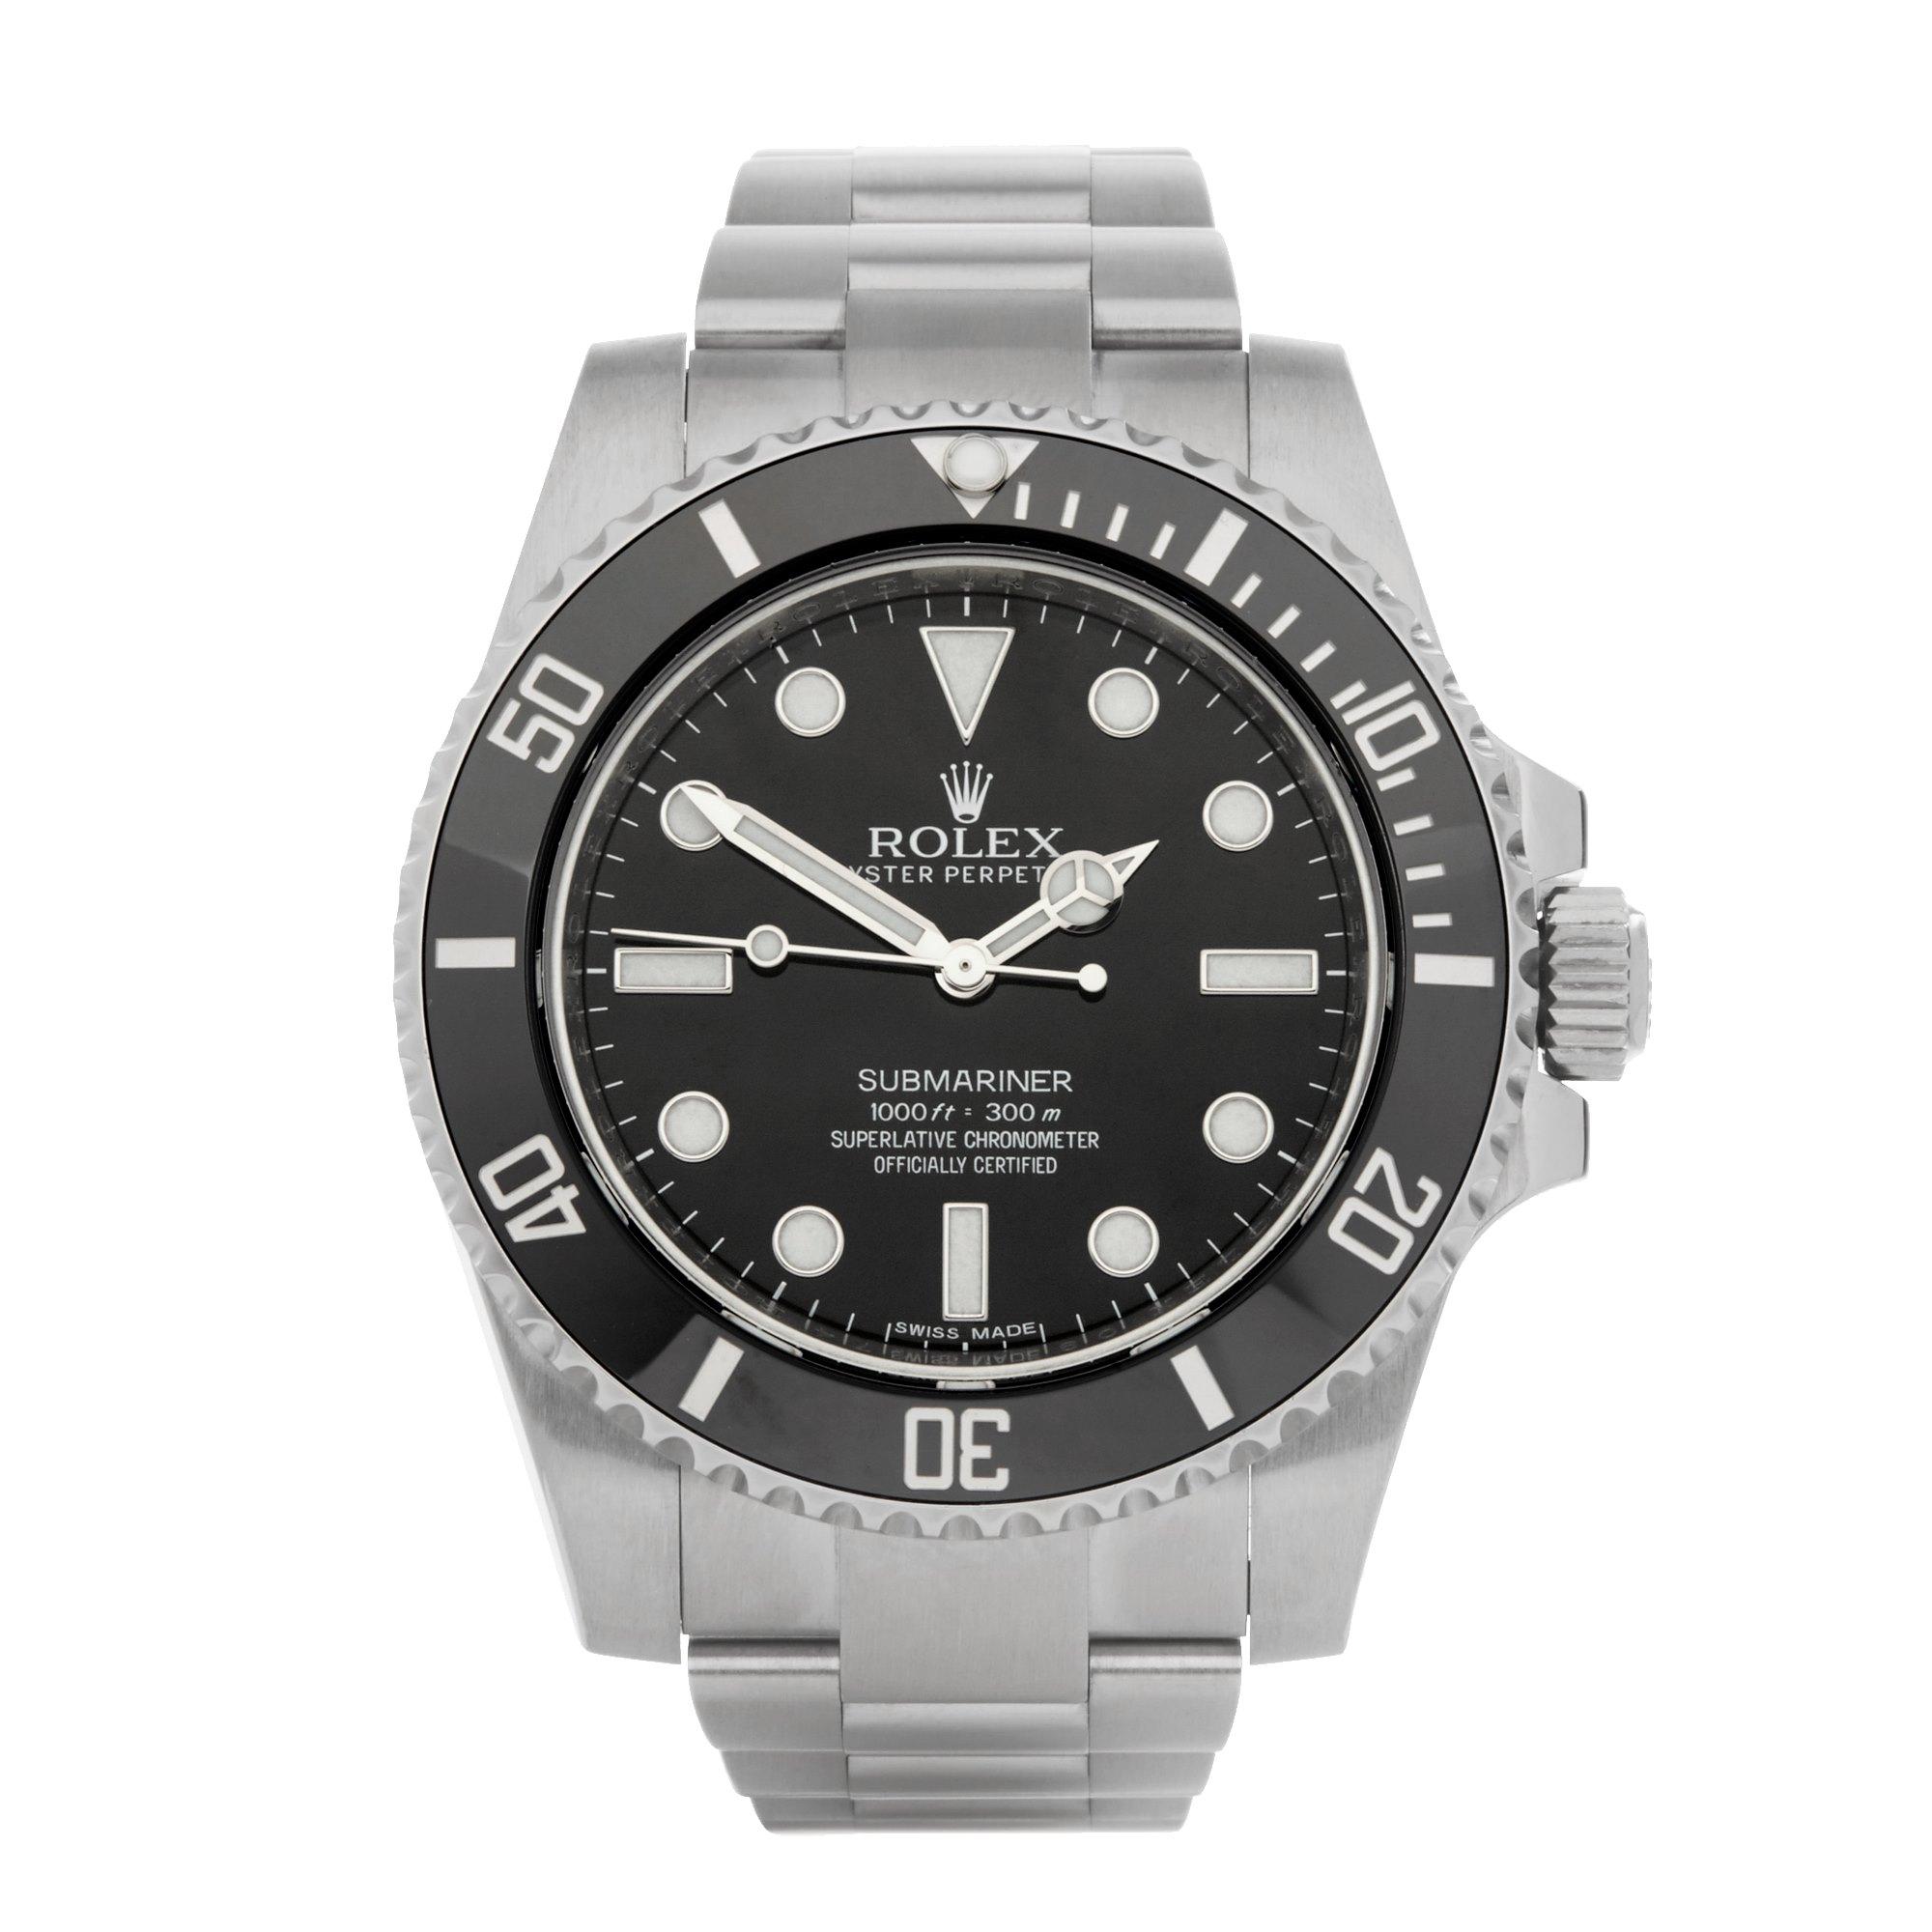 Rolex Submariner Non Date Stainless Steel 114060